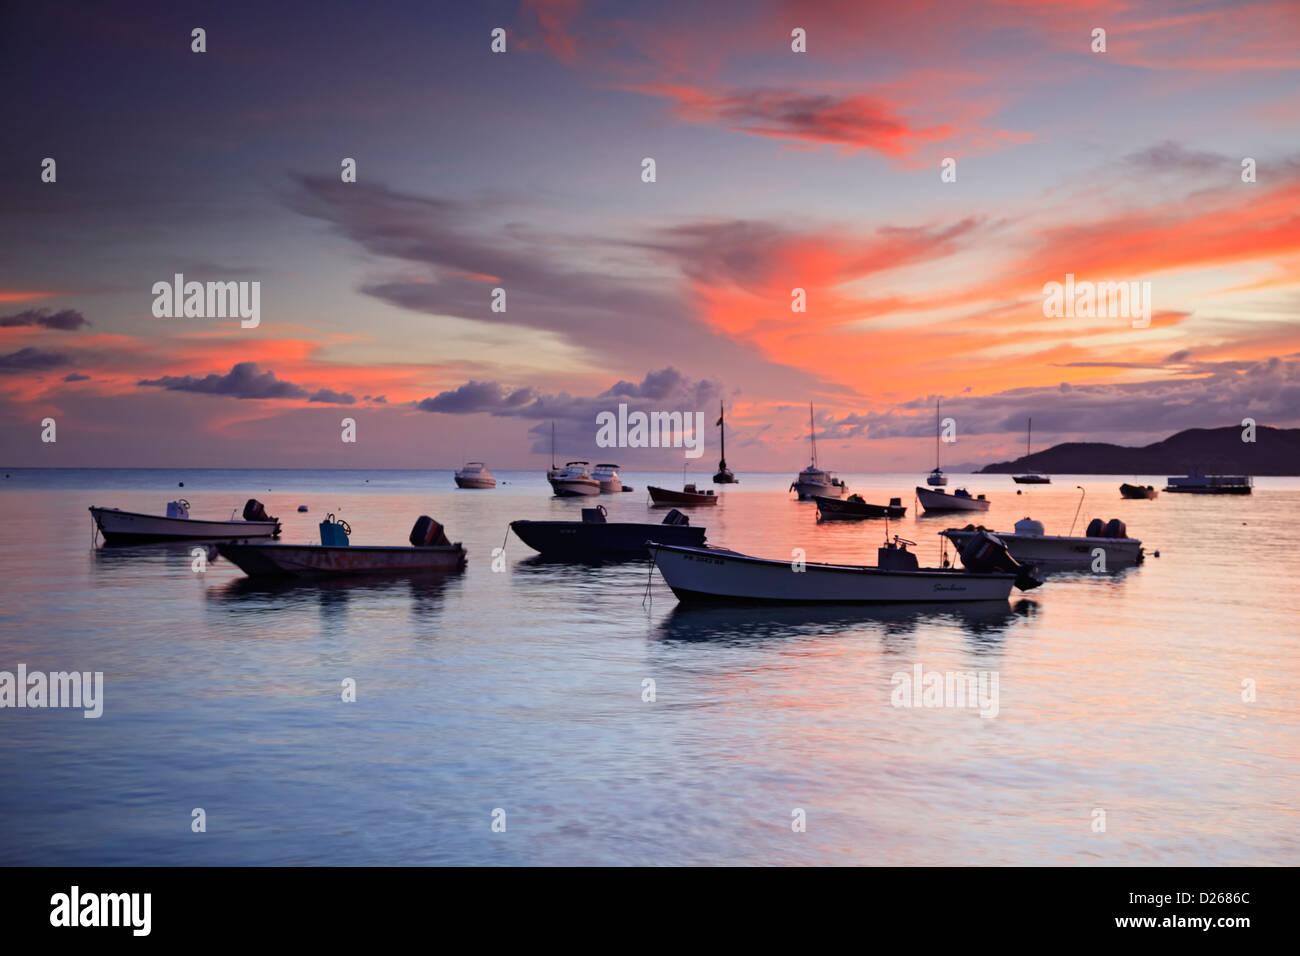 Barcos de pesca al atardecer, esperanza, Vieques, Puerto Rico Imagen De Stock